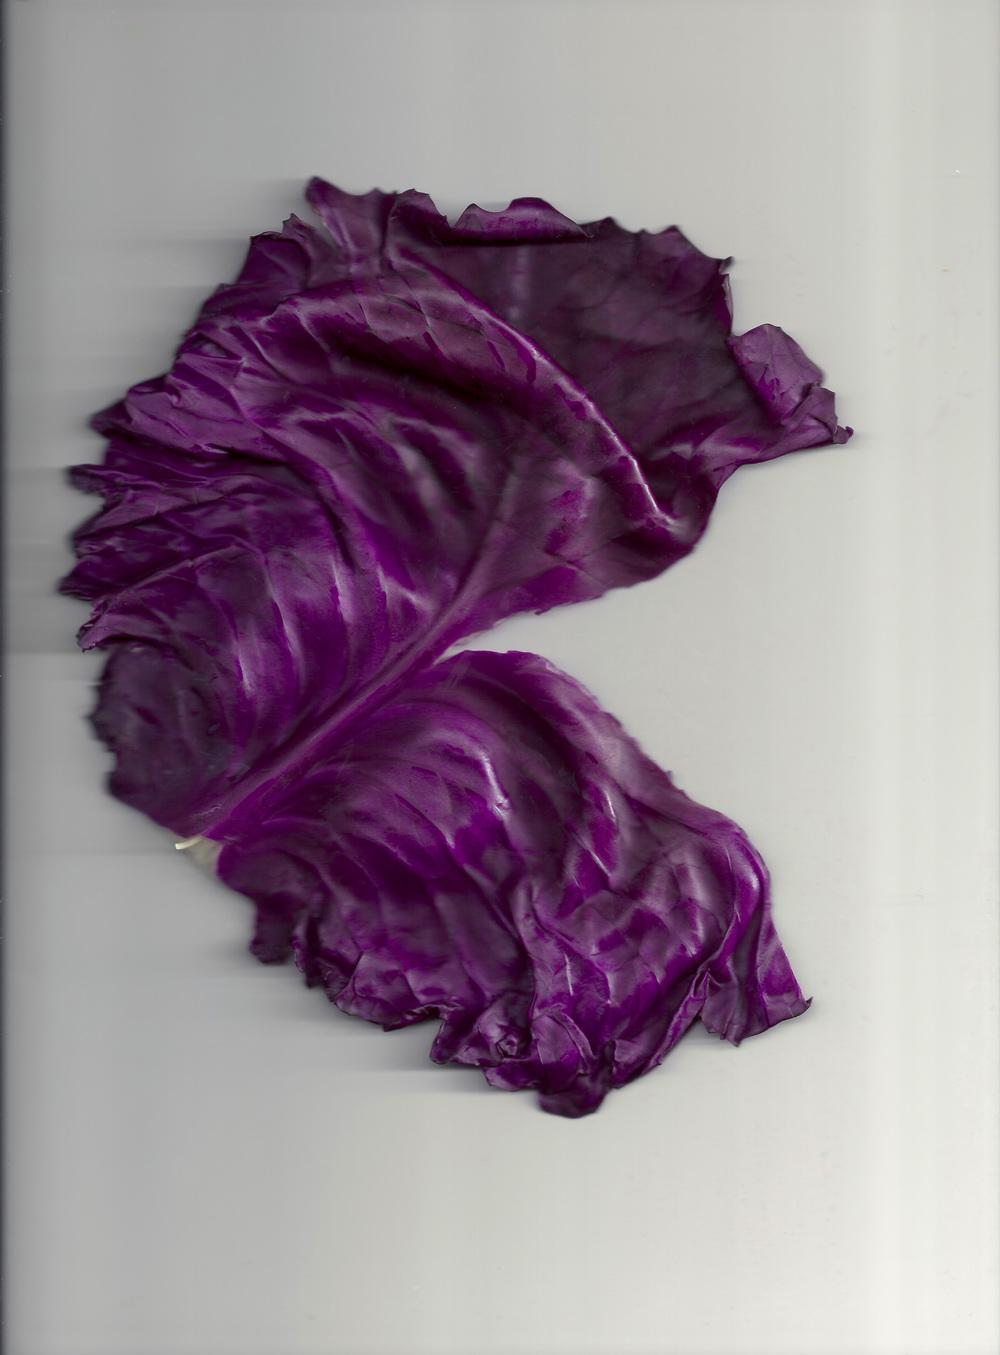 Chou violet 05.jpg